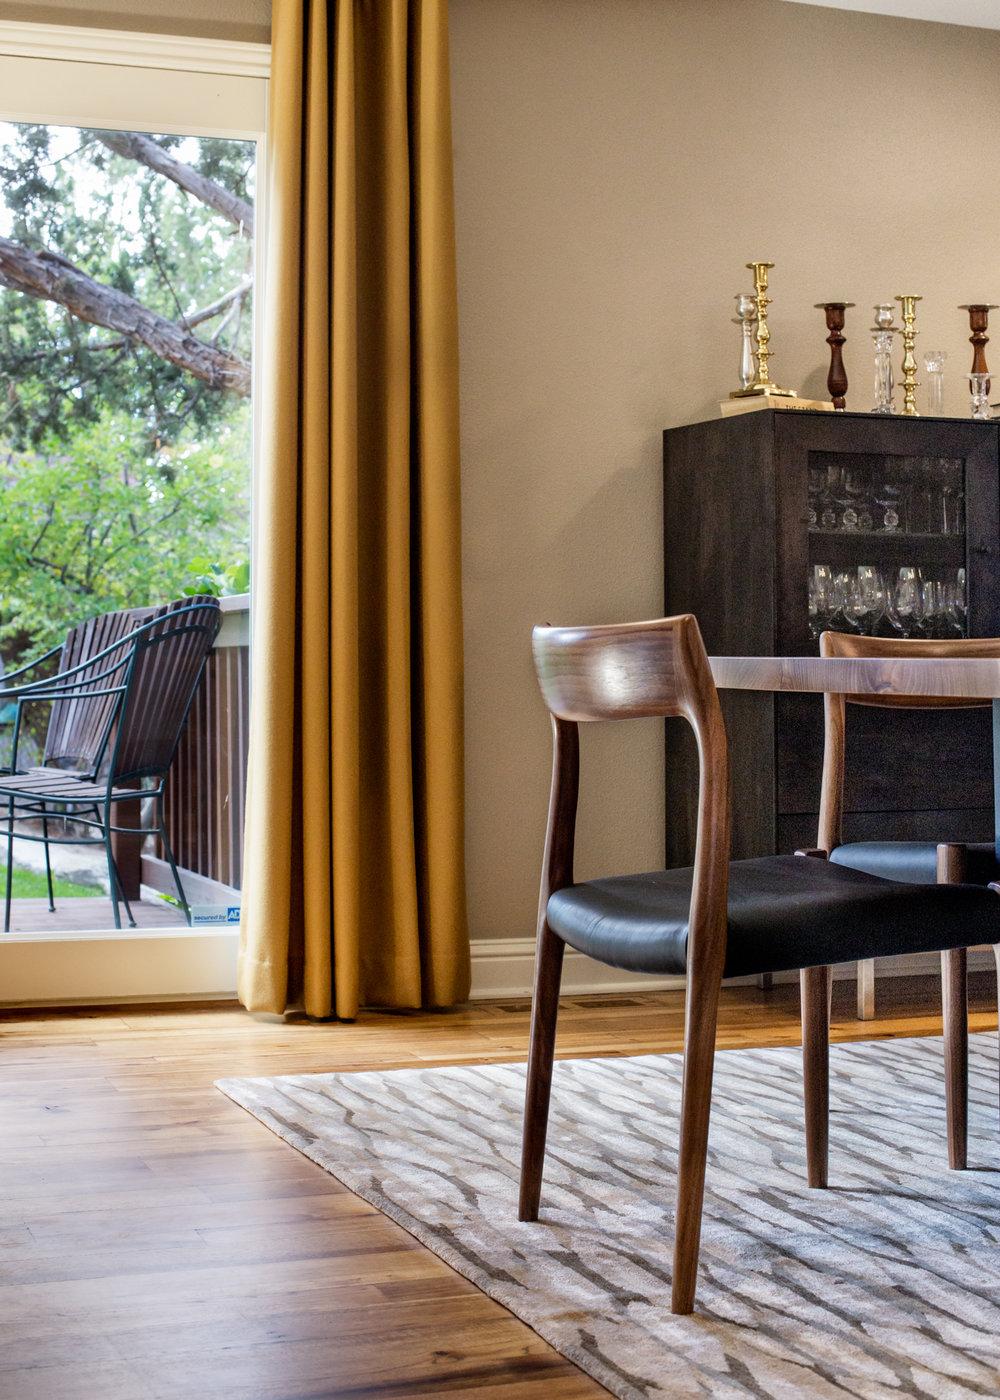 Contemporary Dining Room accessory selection and interior design - Reno, Nevada - Kovac Design